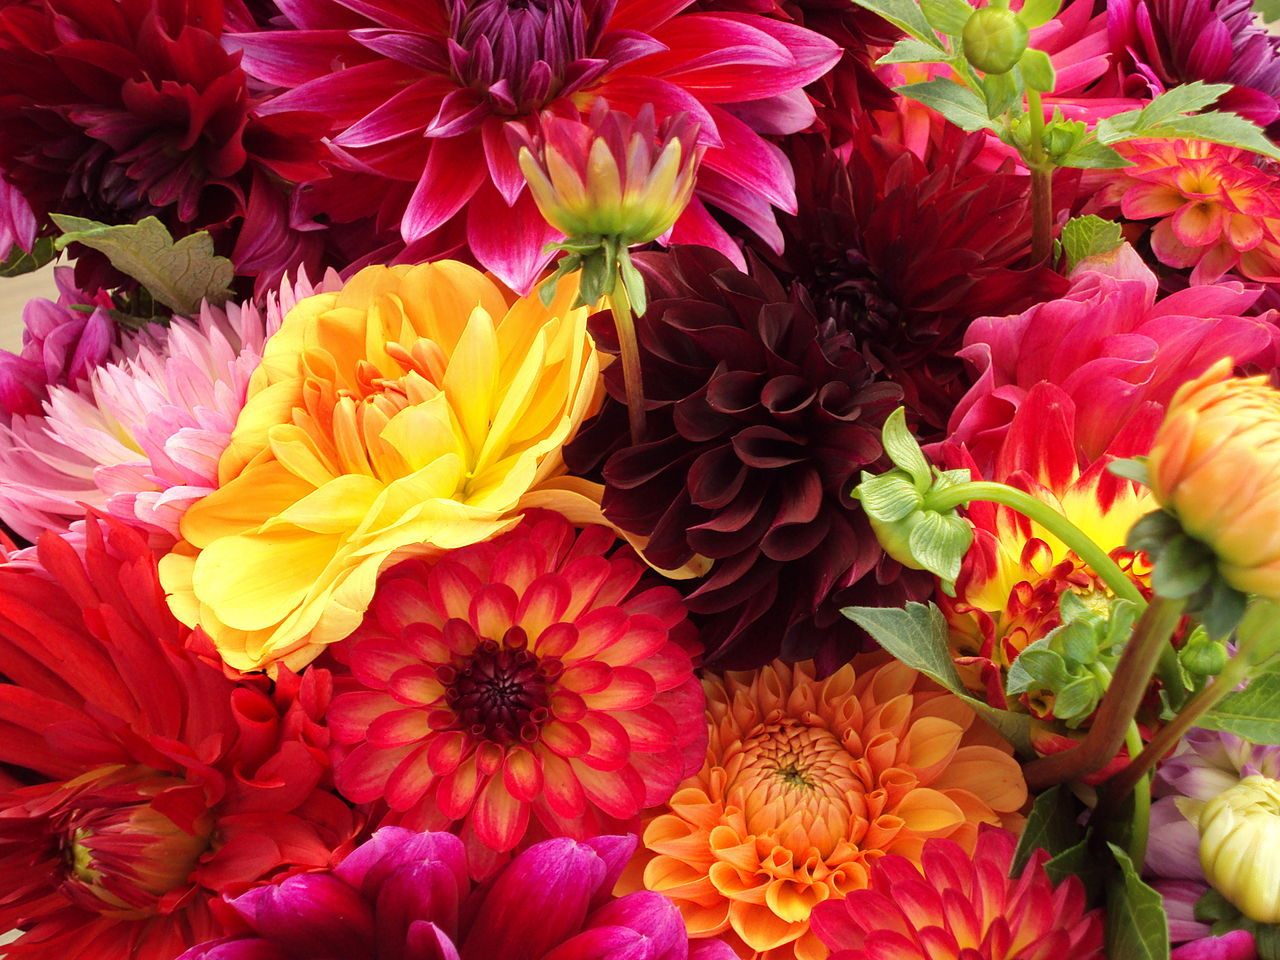 File Bunch Of Flowers Jpg Wikimedia Commons